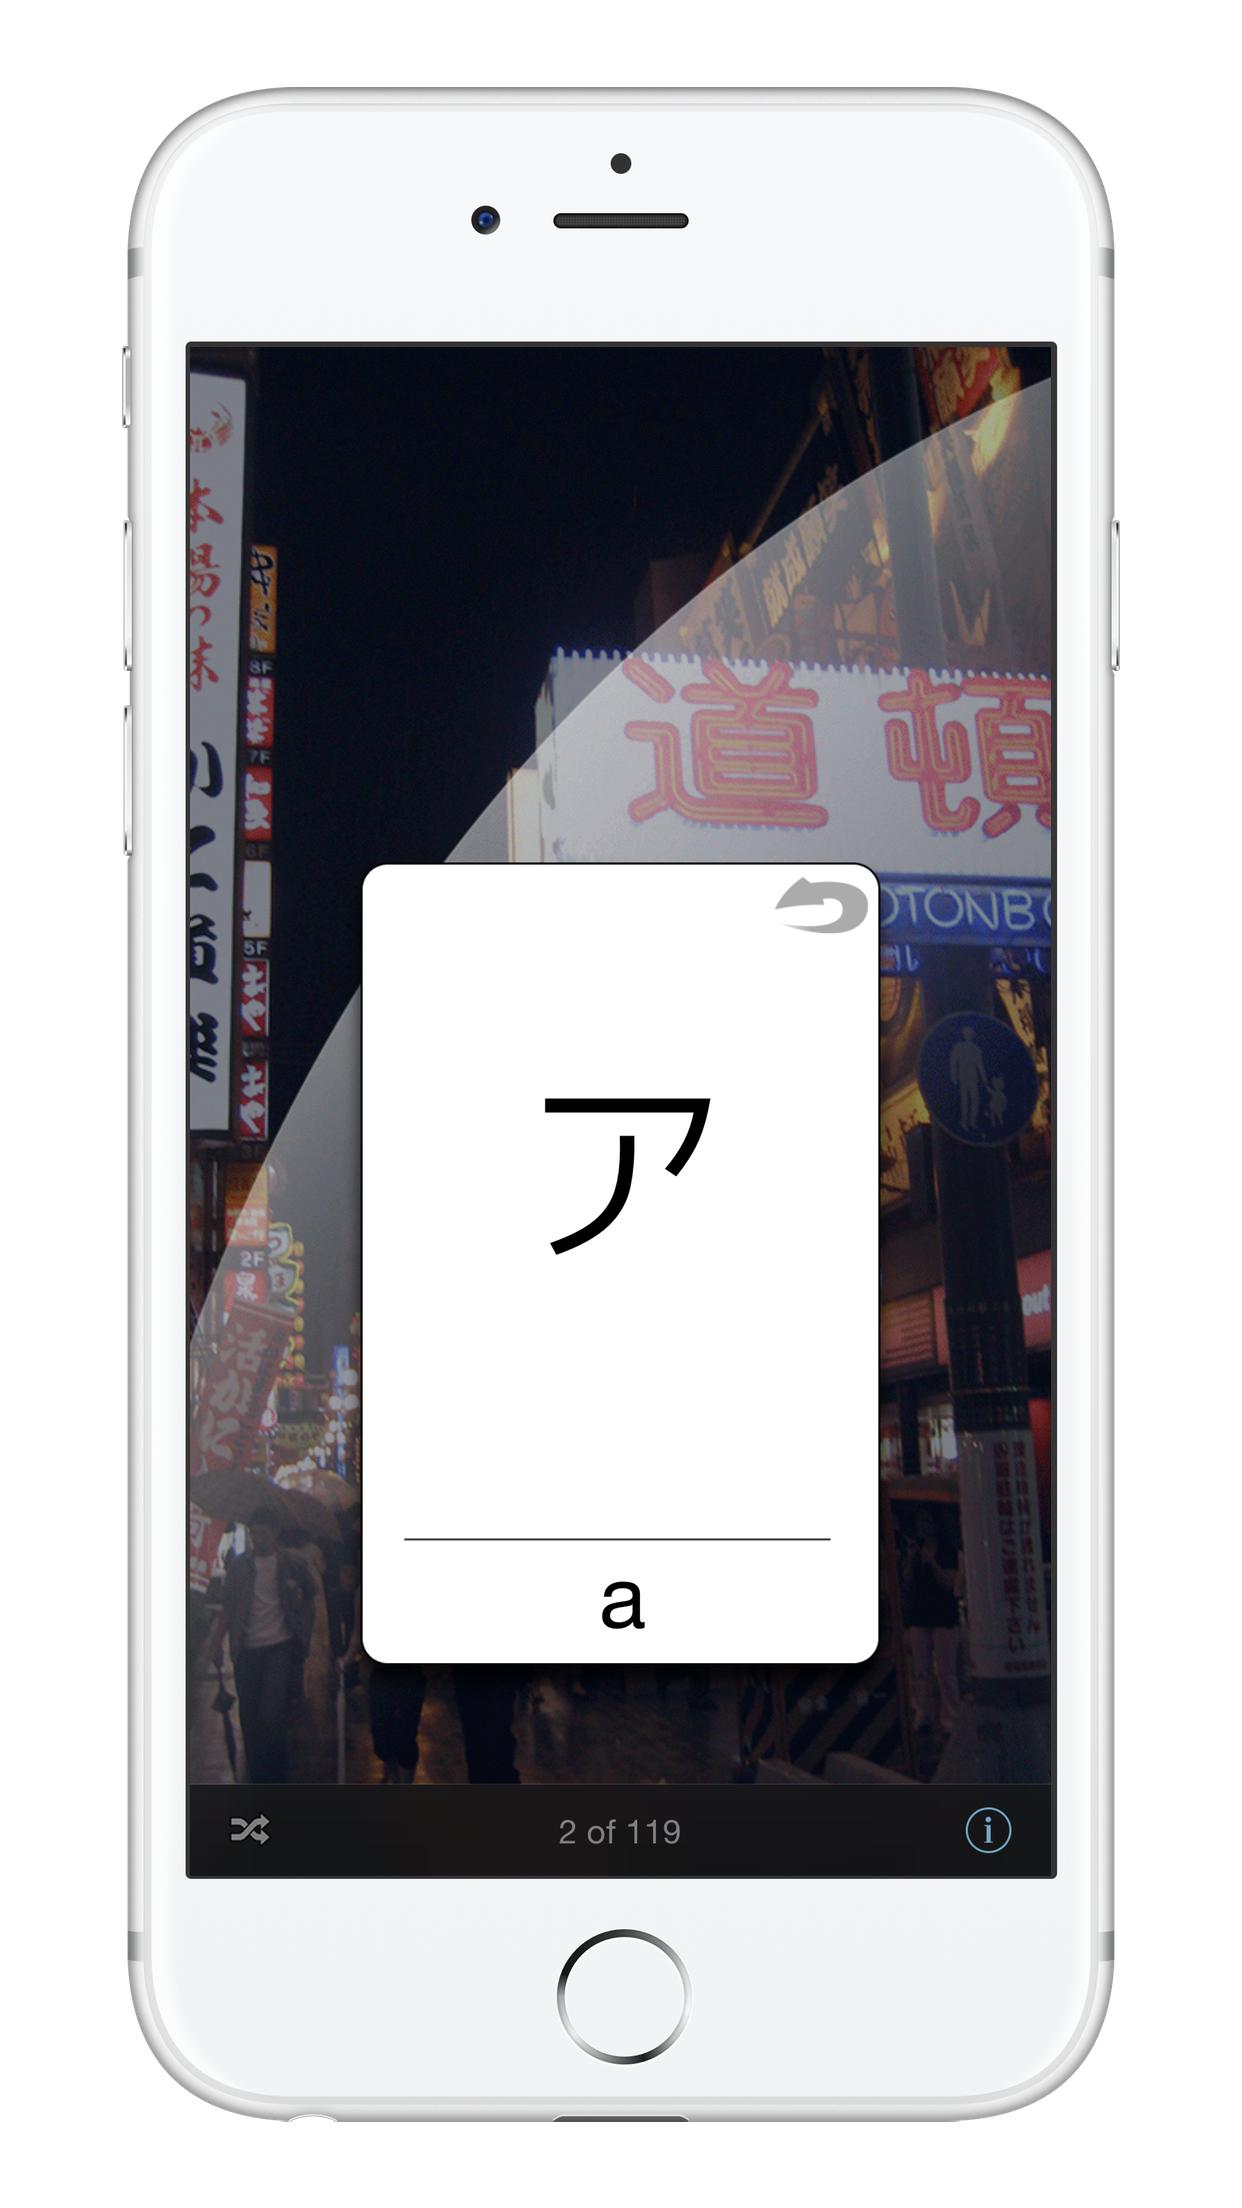 Katakana screenshot 2.png